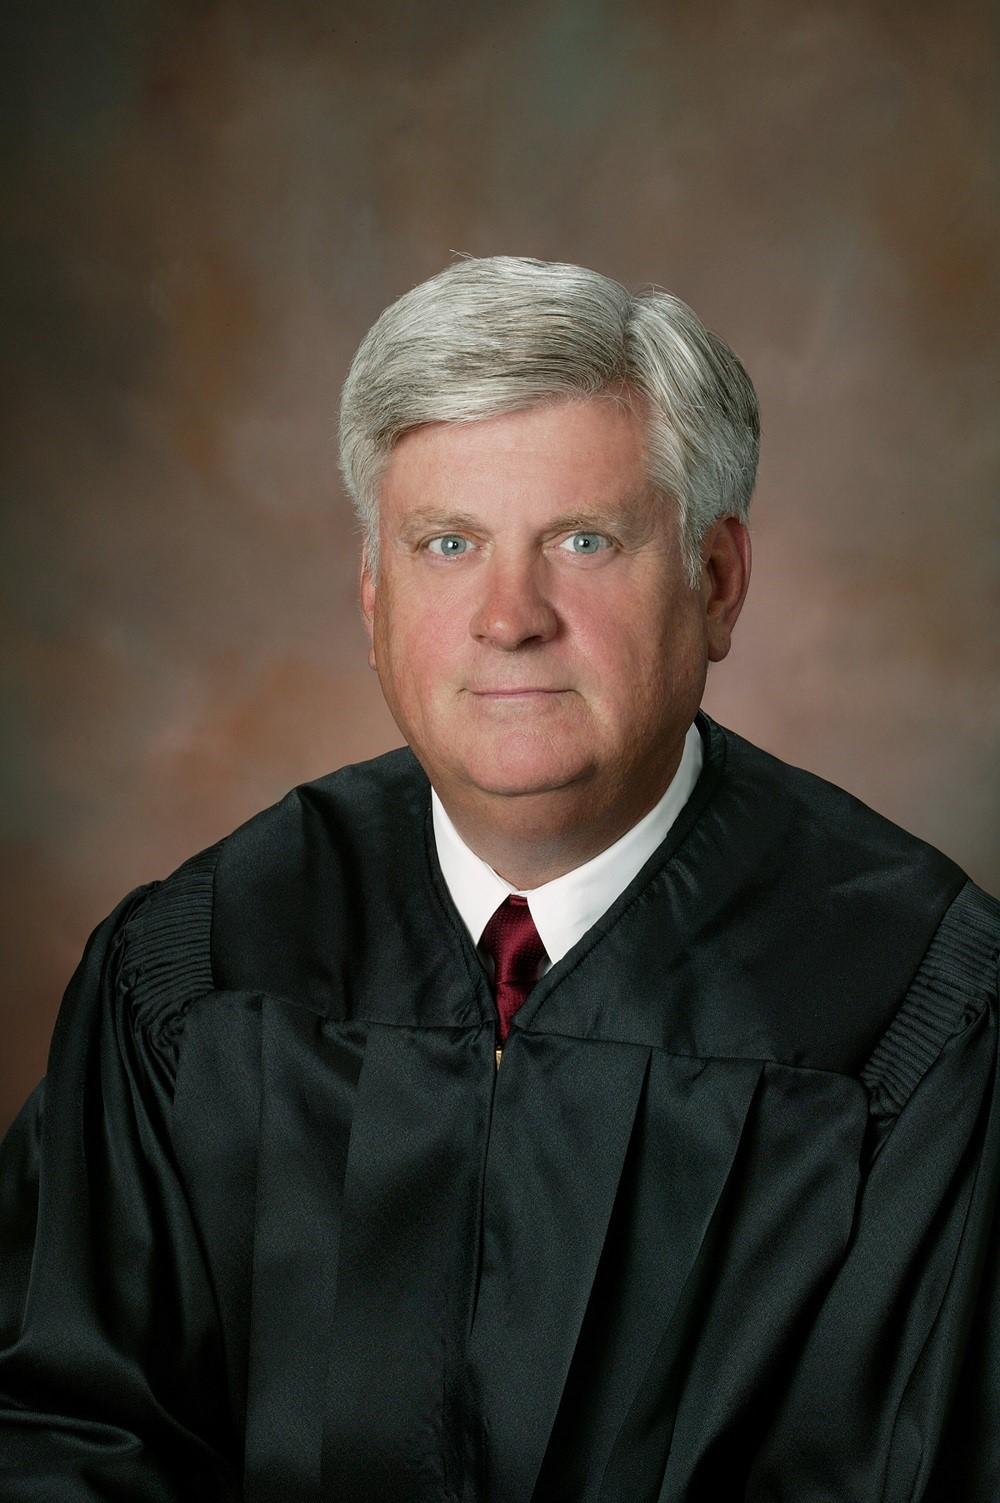 Justice Michael K. Randolph